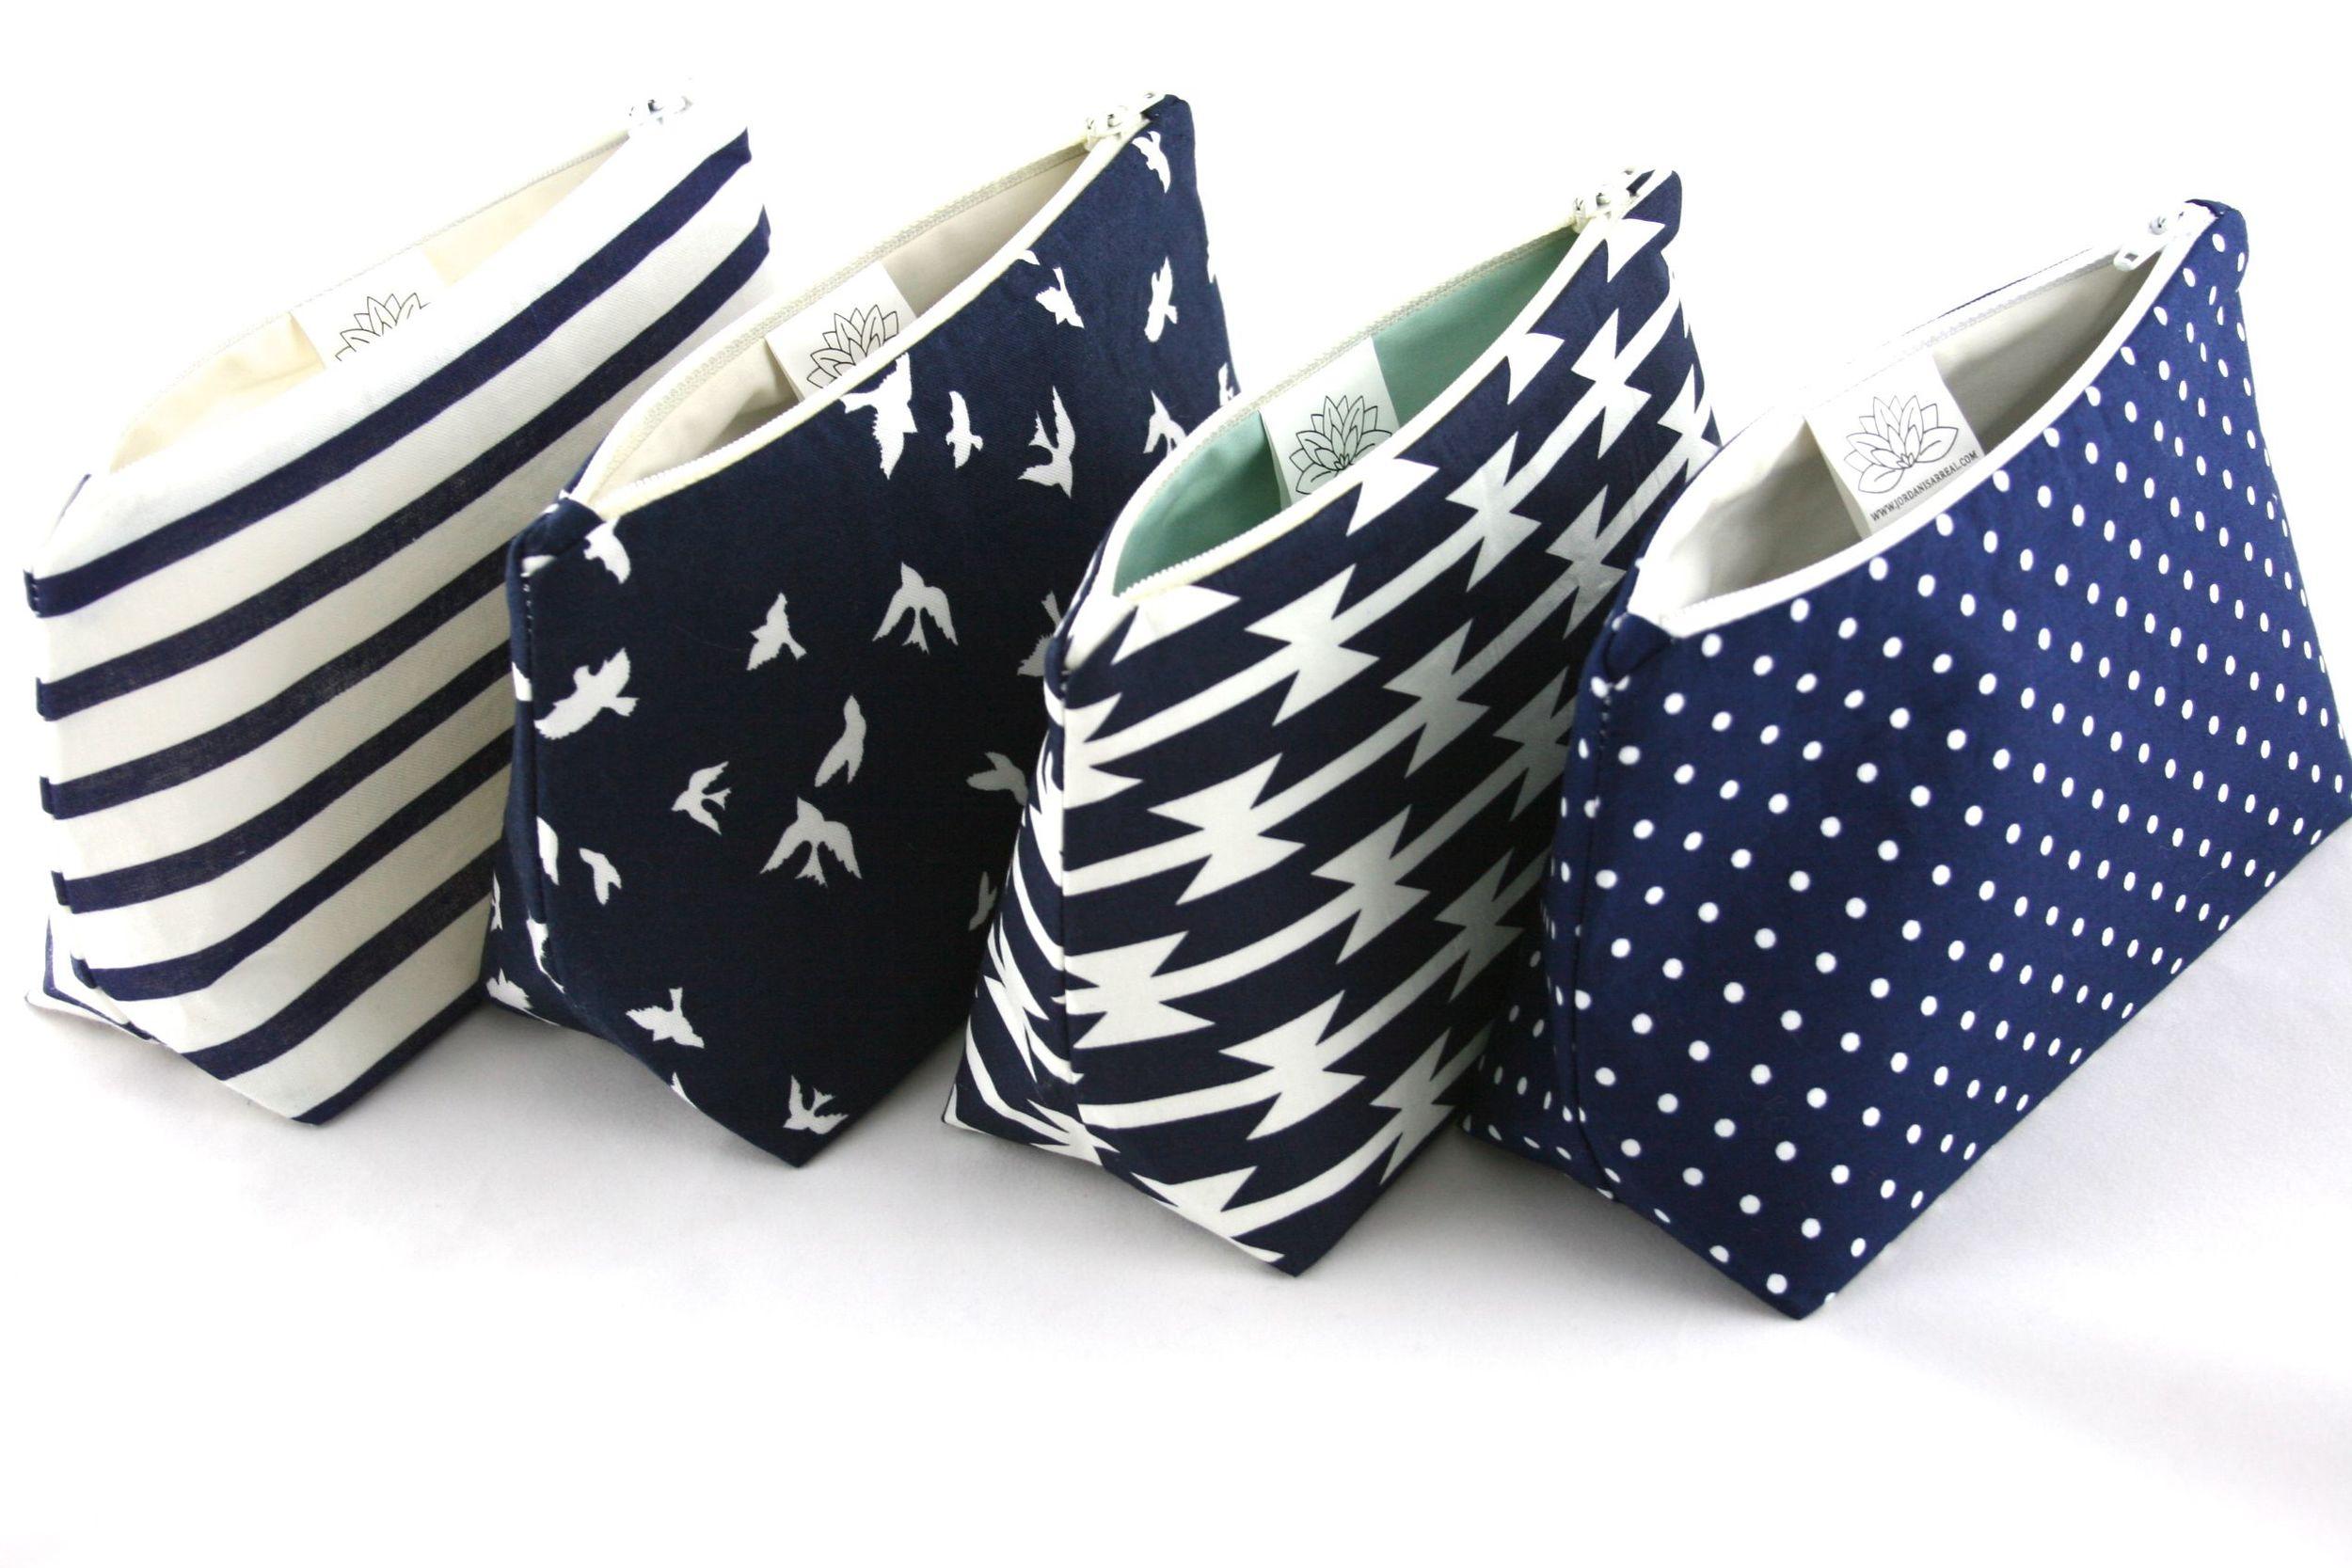 Navy Cosmetic Bags - Le Pique Nique by Jordani Sarreal 06.jpg